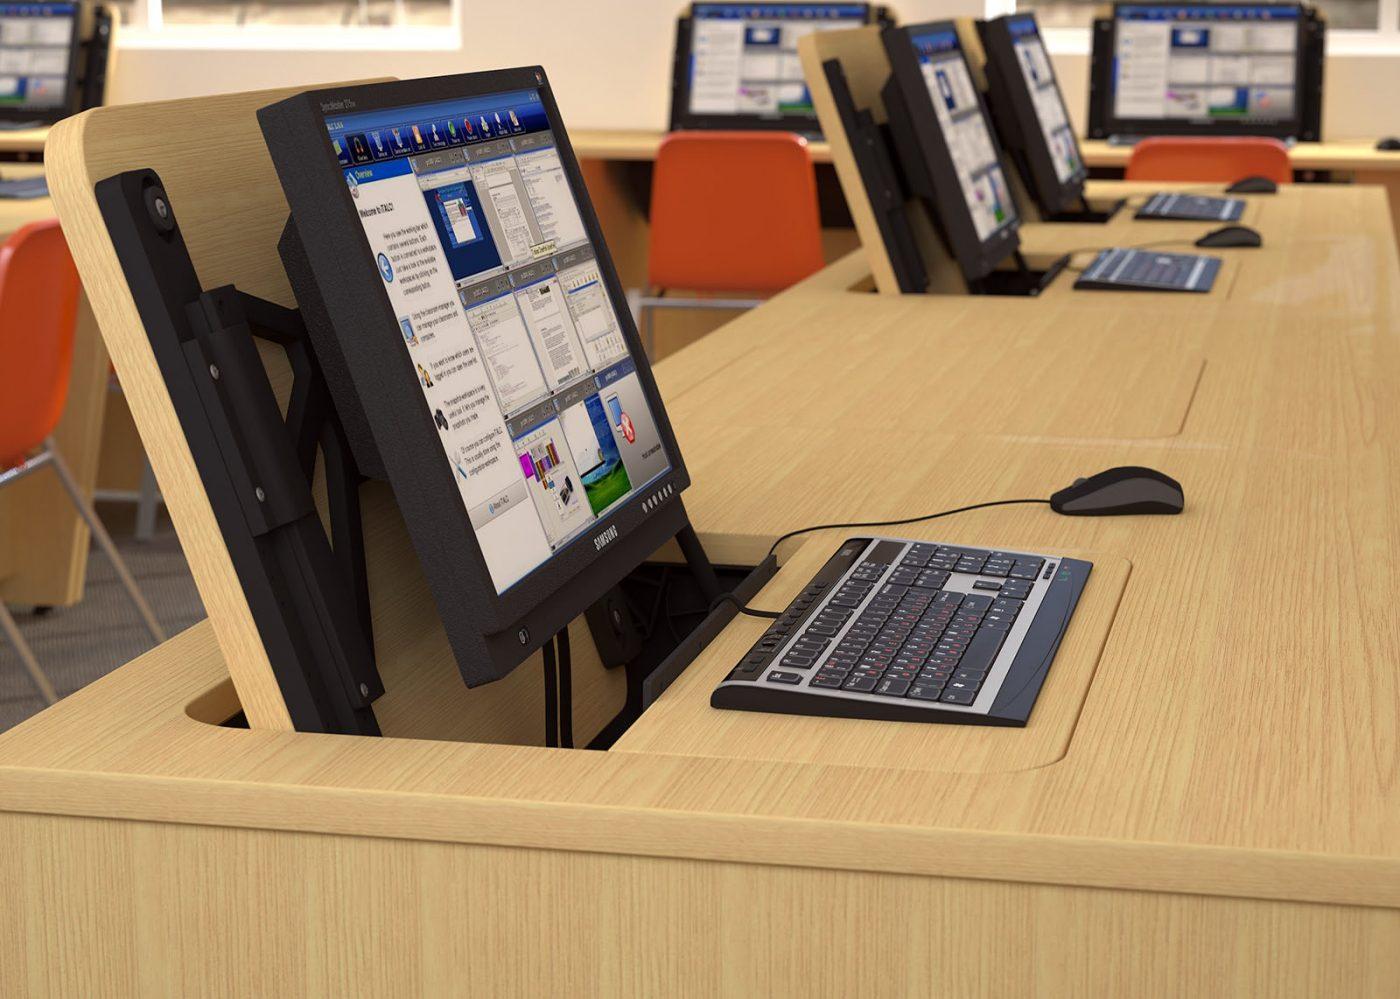 IT desk, school furniture, classroom furniture, built in monitor